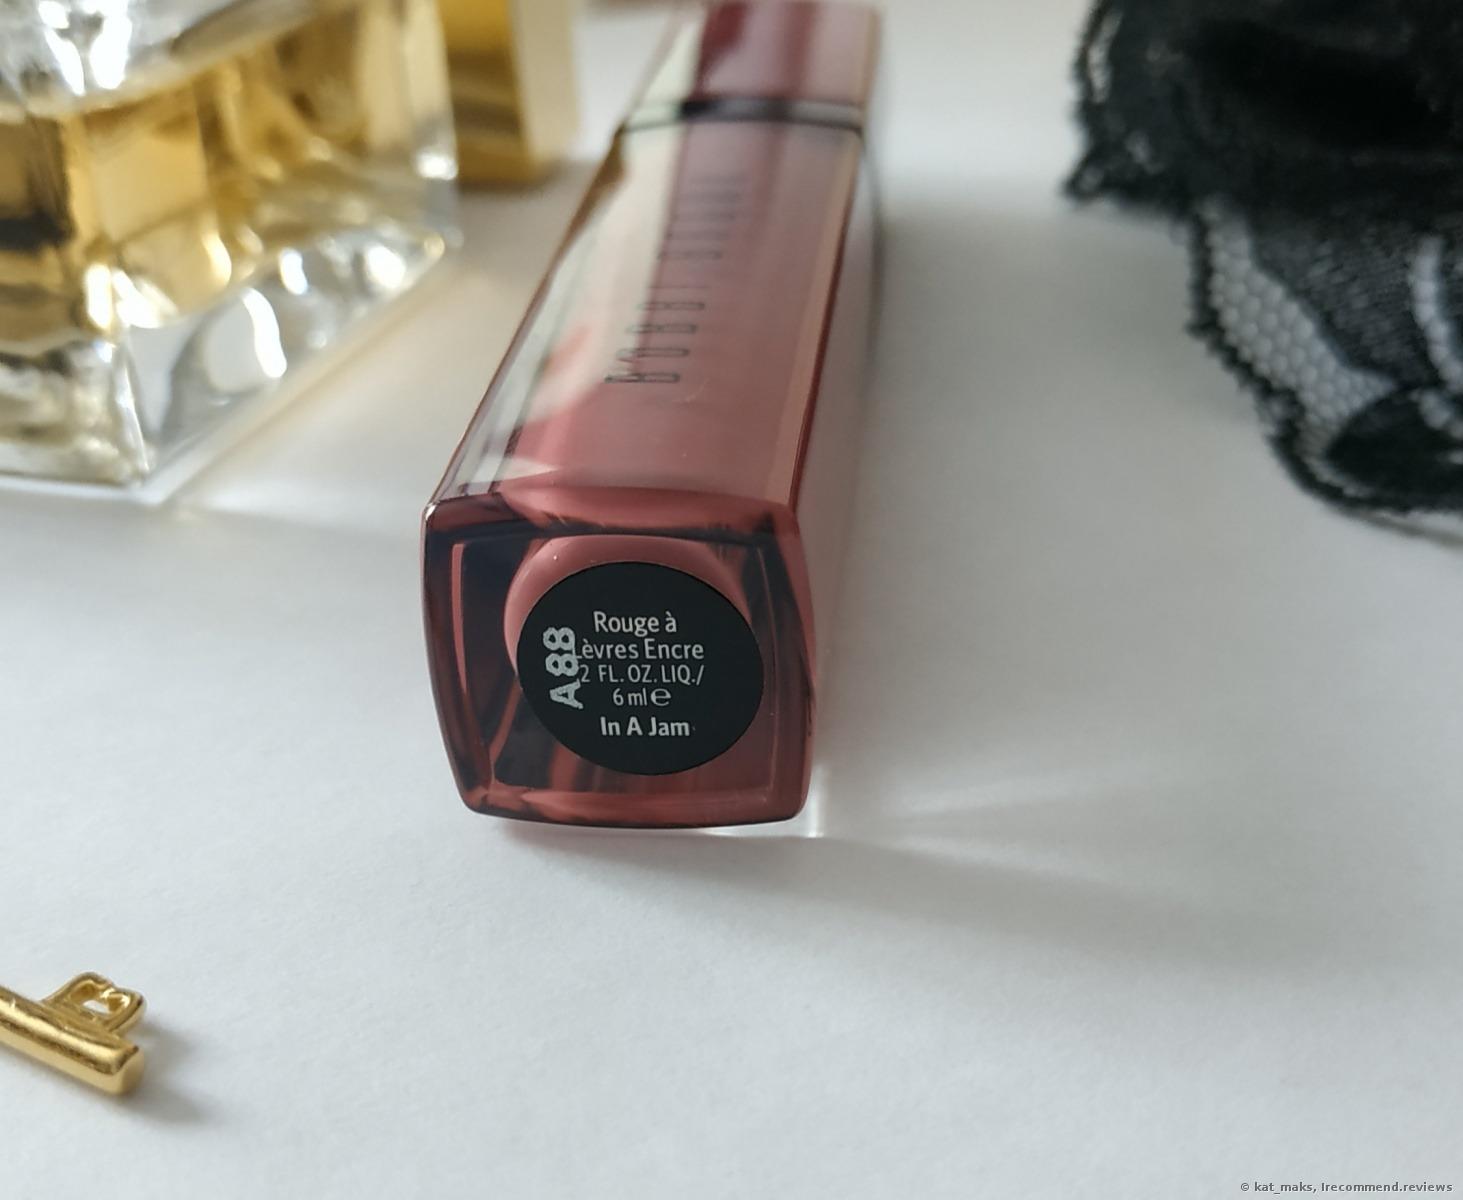 Bobbi Brown Crushed Liquid Lipstick 171 Bobbi Brown Crushed